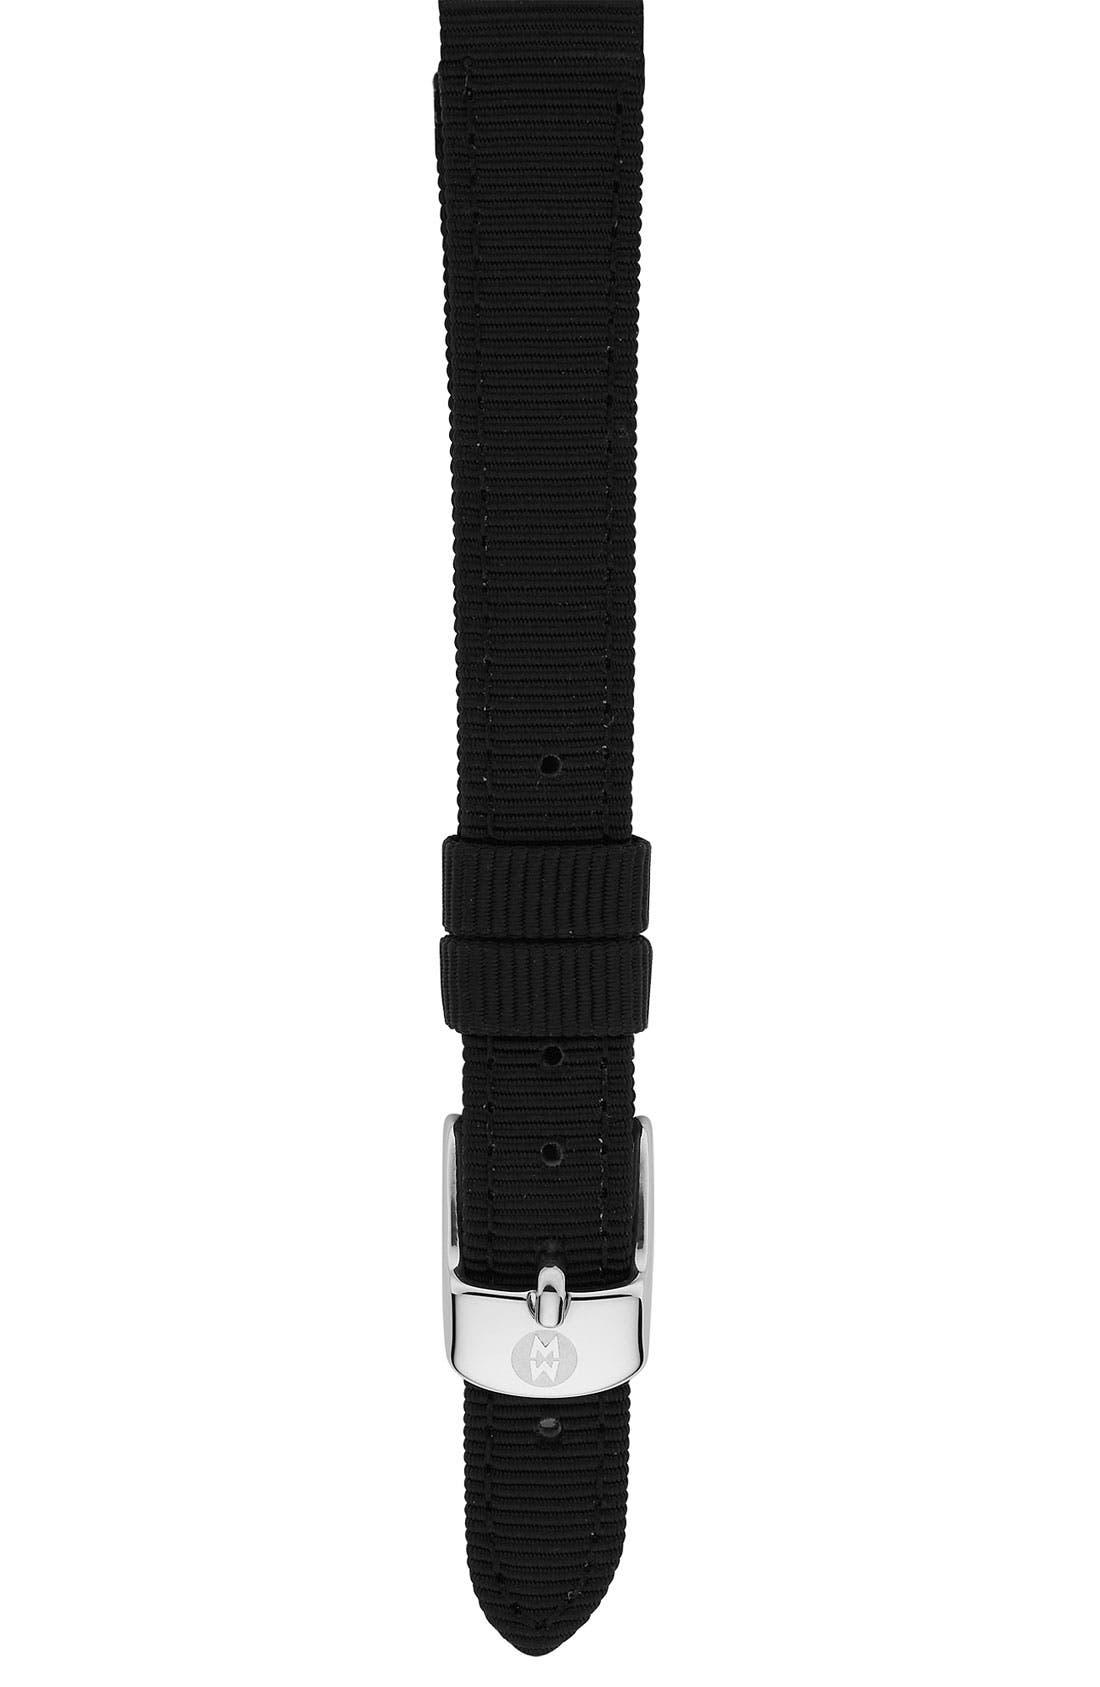 Main Image - MICHELE 12mm Grosgrain Watch Strap